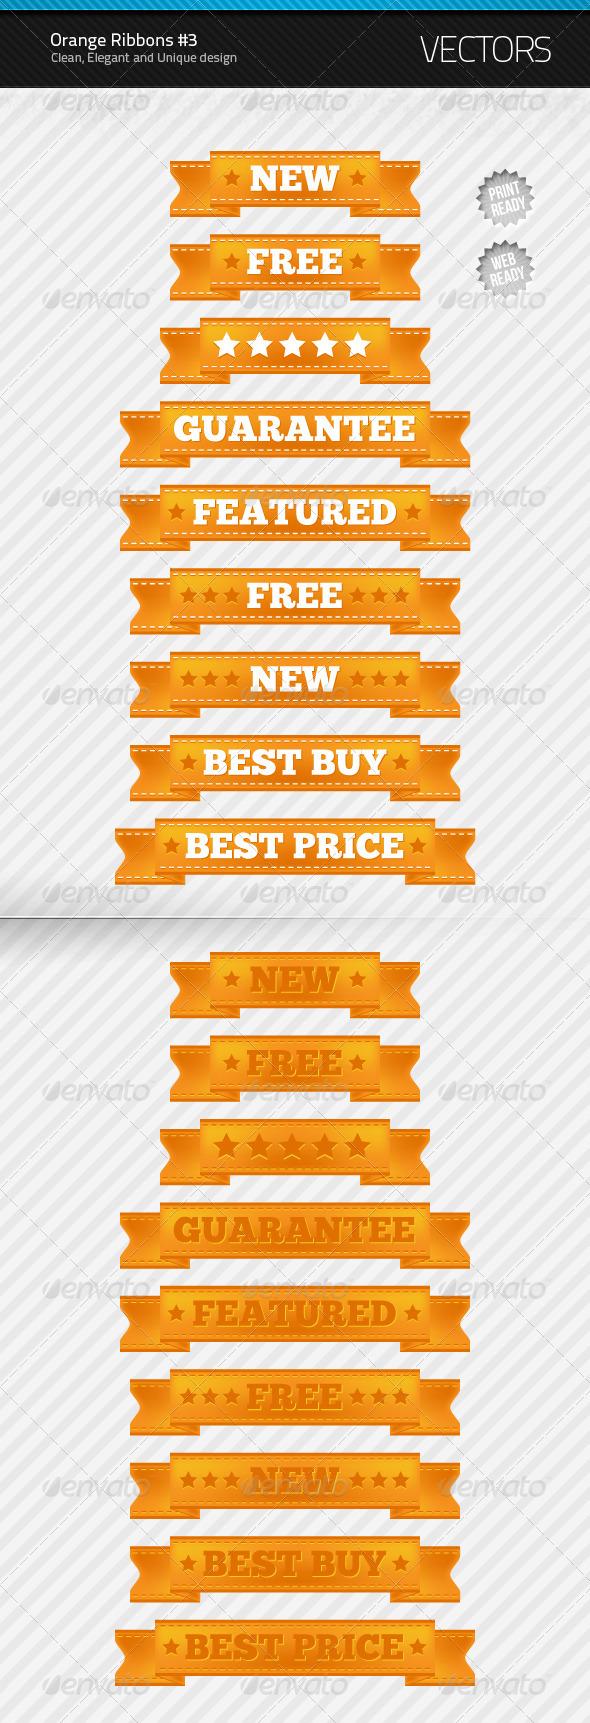 GraphicRiver Orange Ribbons #3 232377